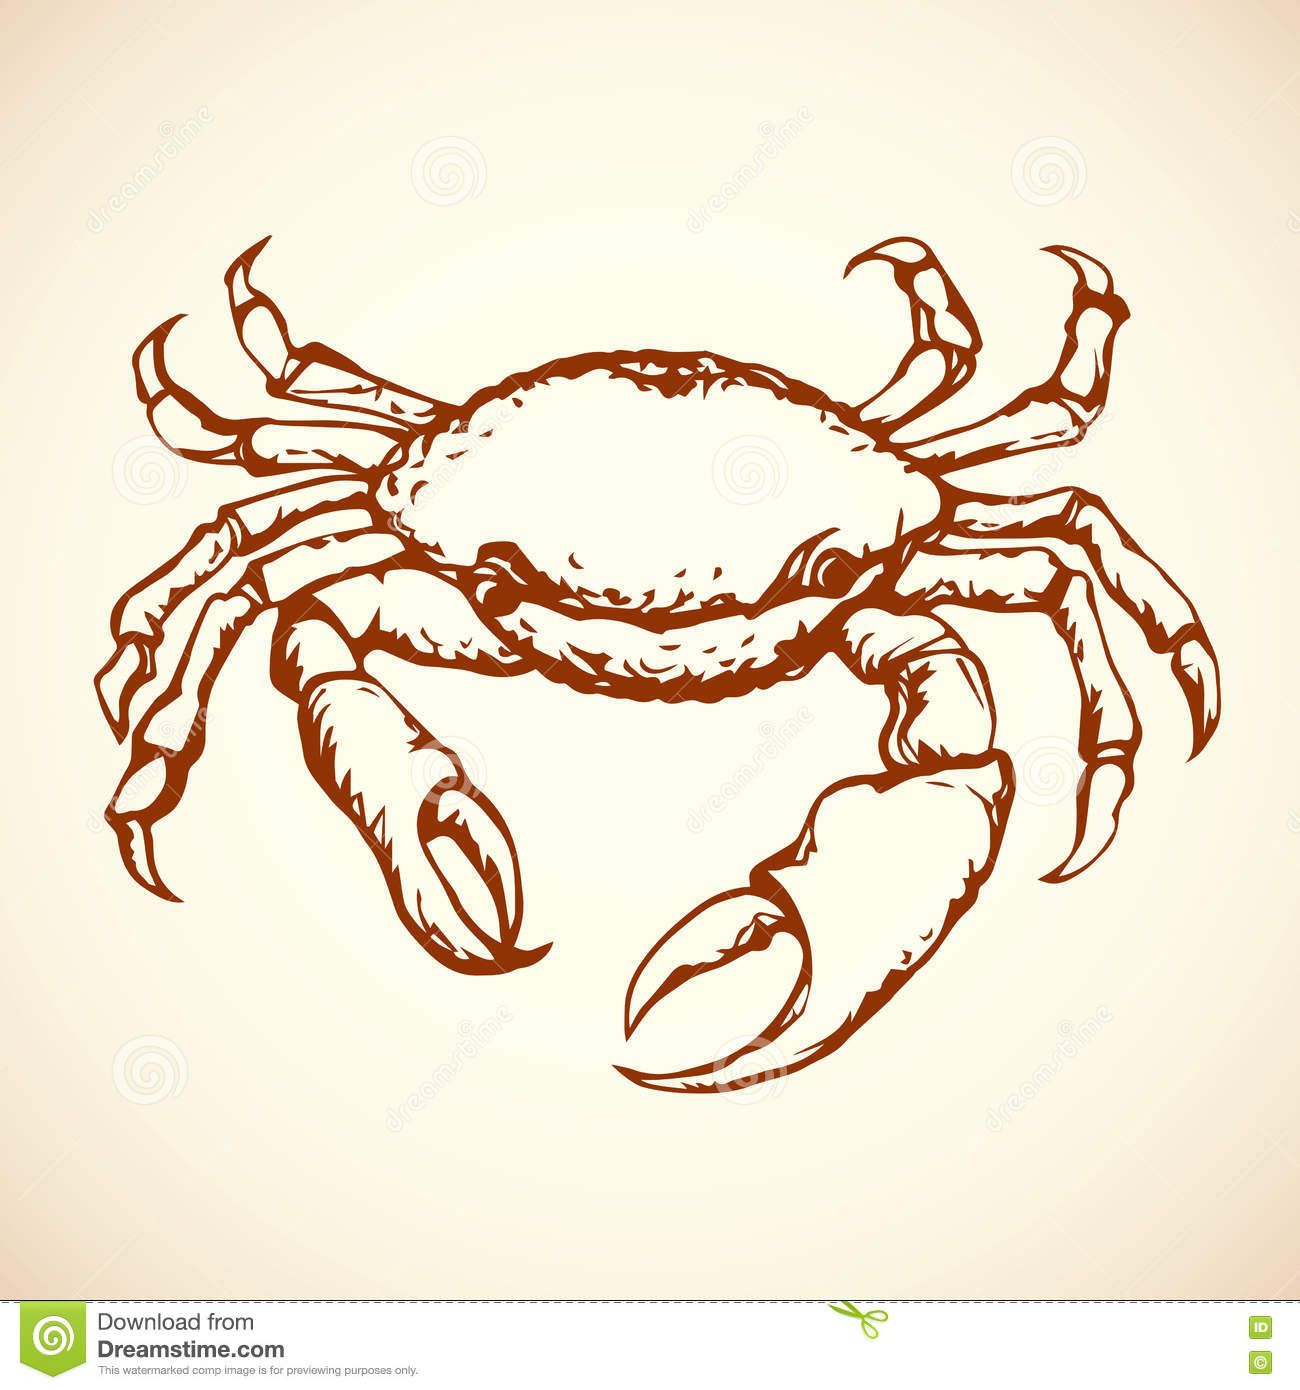 Crab Vector Drawing Illustration About Animal Aquatic Arthropod Crustacean Engraving Cartoon Cooking Claw Delicious Del Vector Drawing Crab Drawings